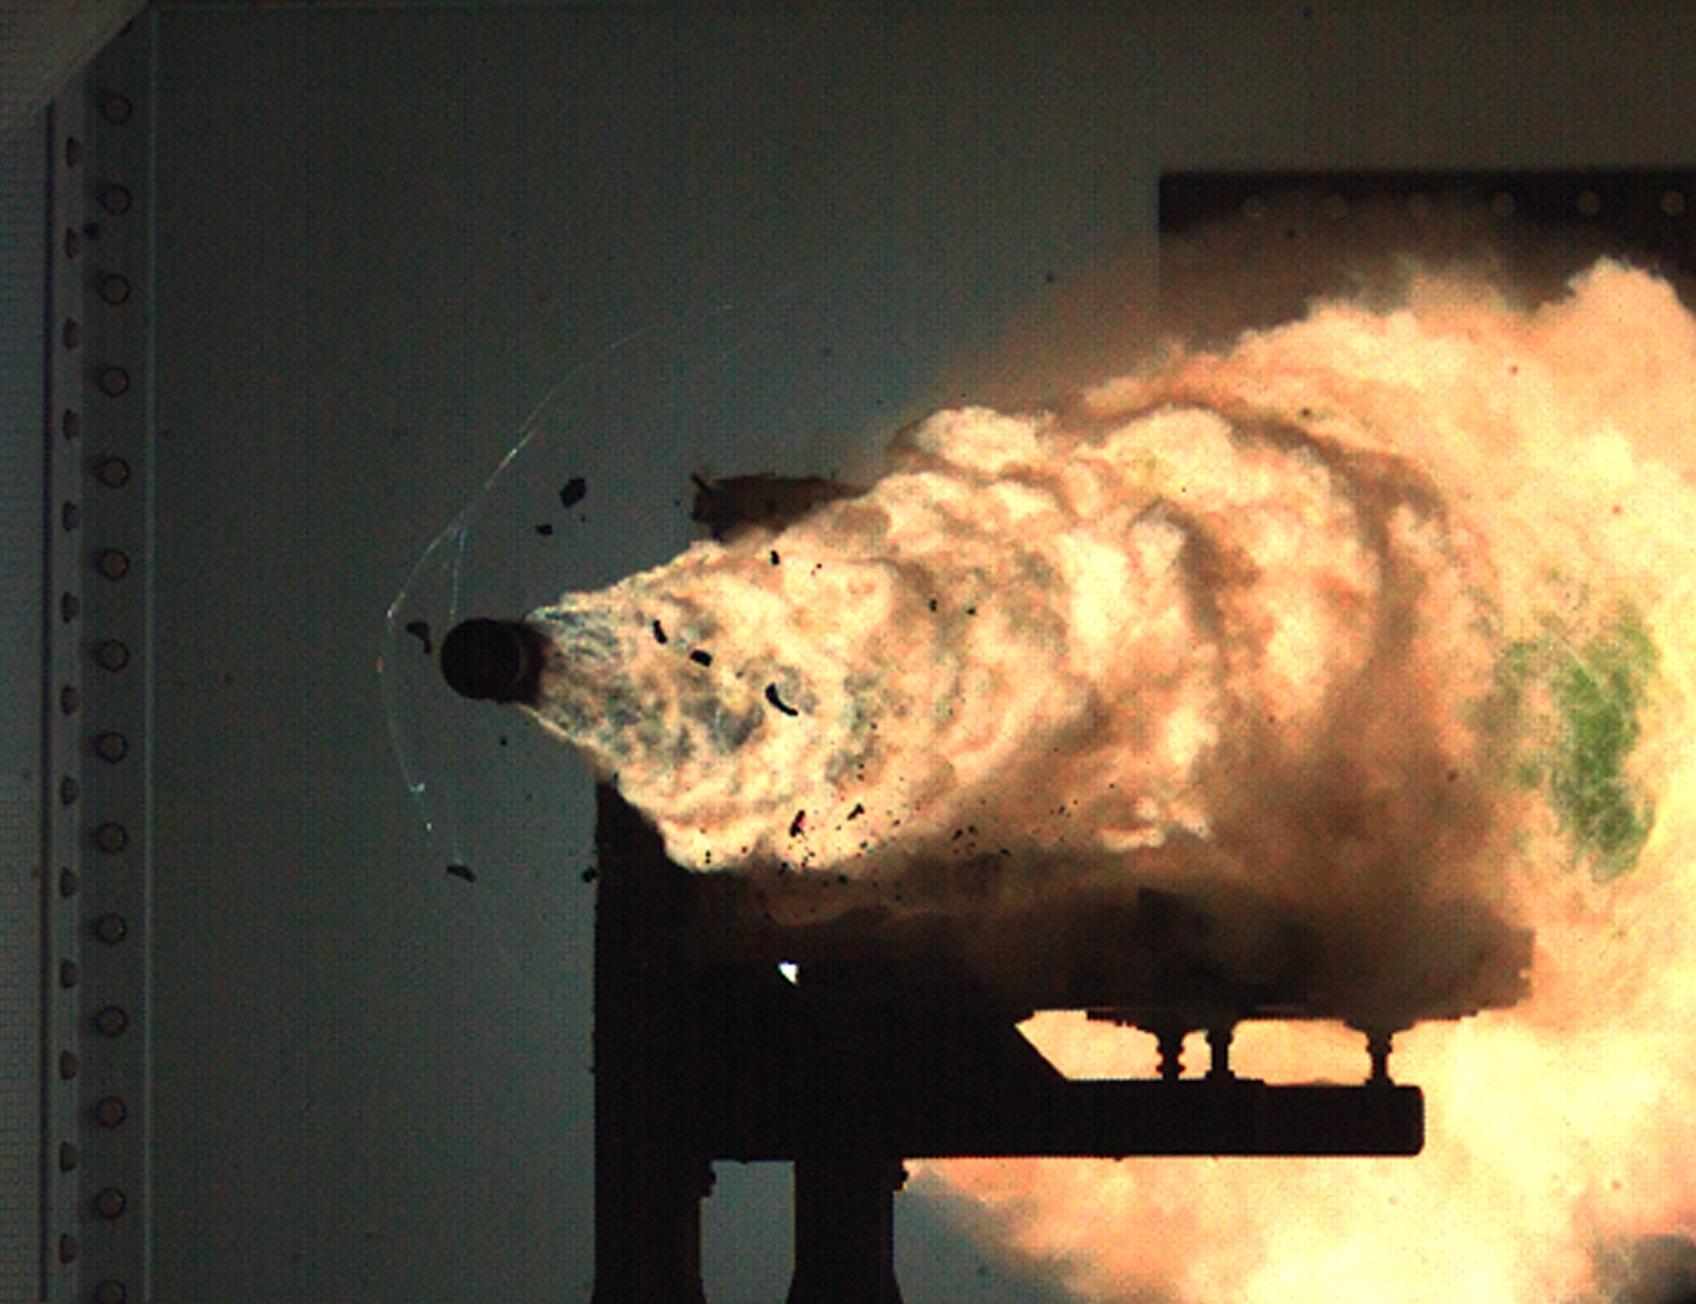 """Blow the Top Off a Mountain"": The Destructive Power of a U.S. Navy Railgun?"